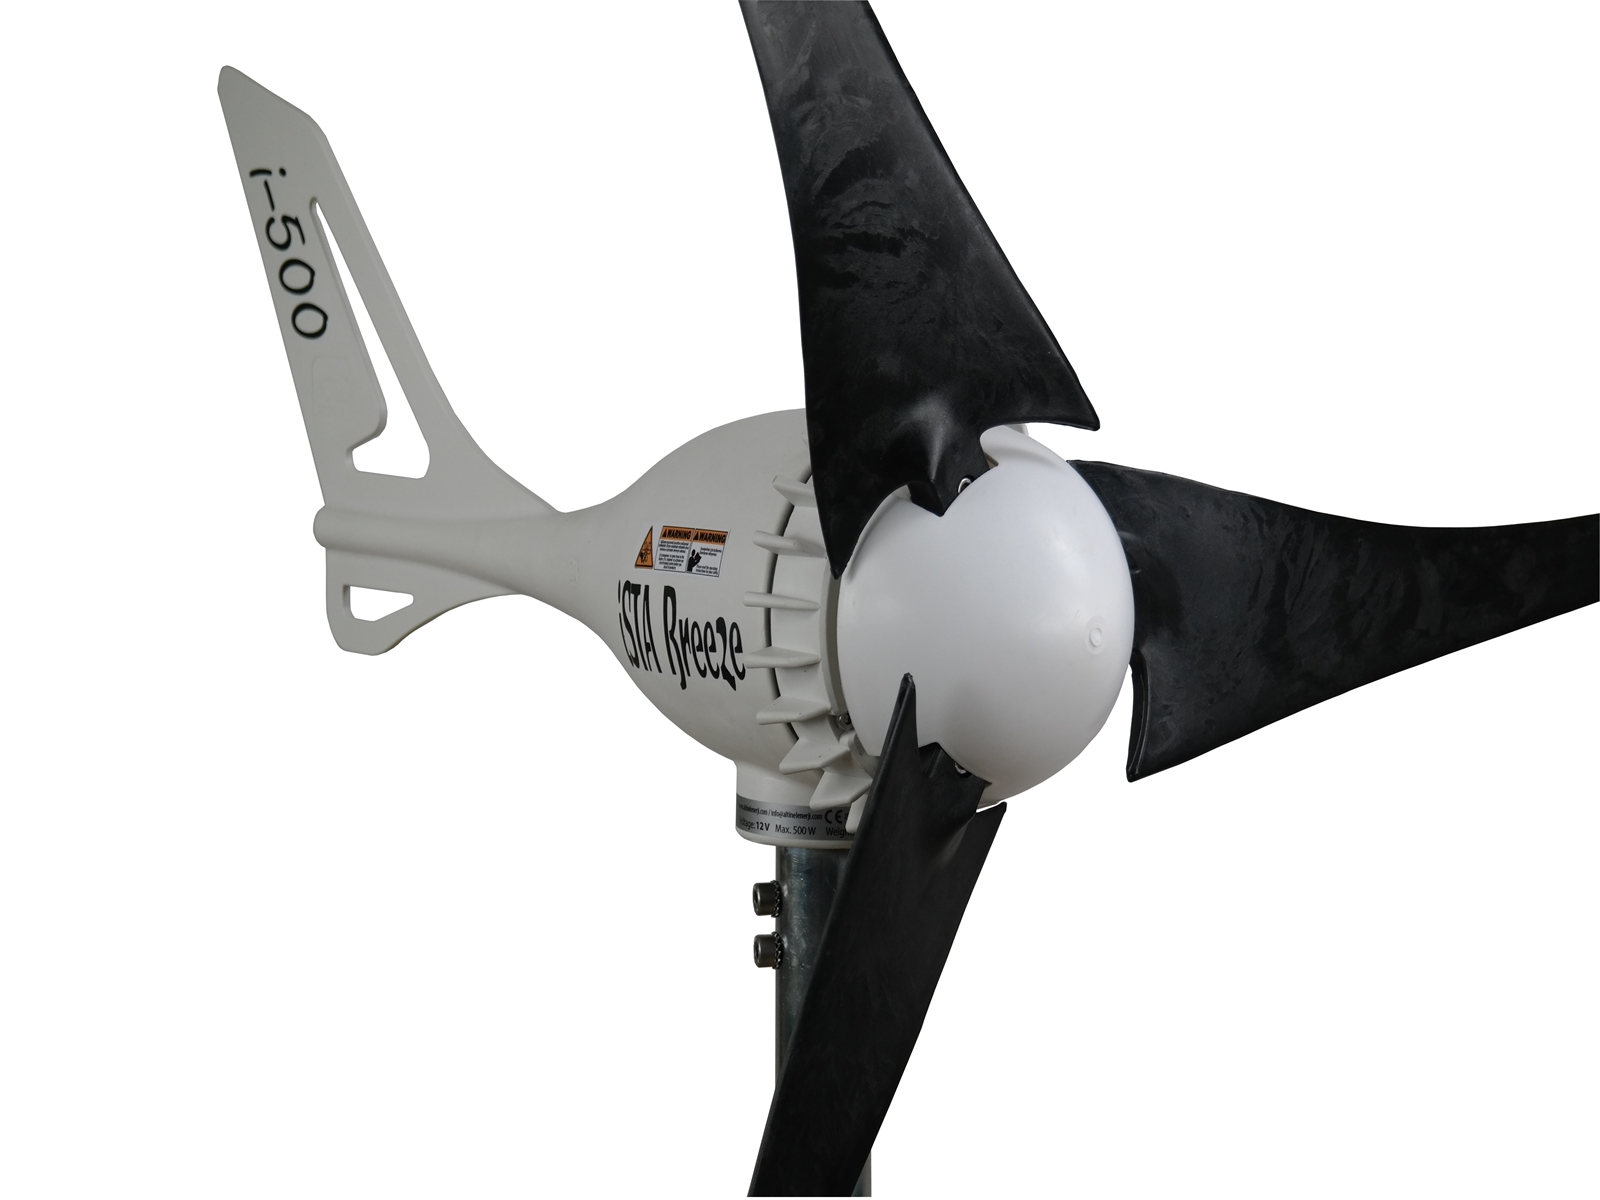 Windgenerator-i-500-Windturbine-500W-Windenergie-Windrad-alternative-Energie